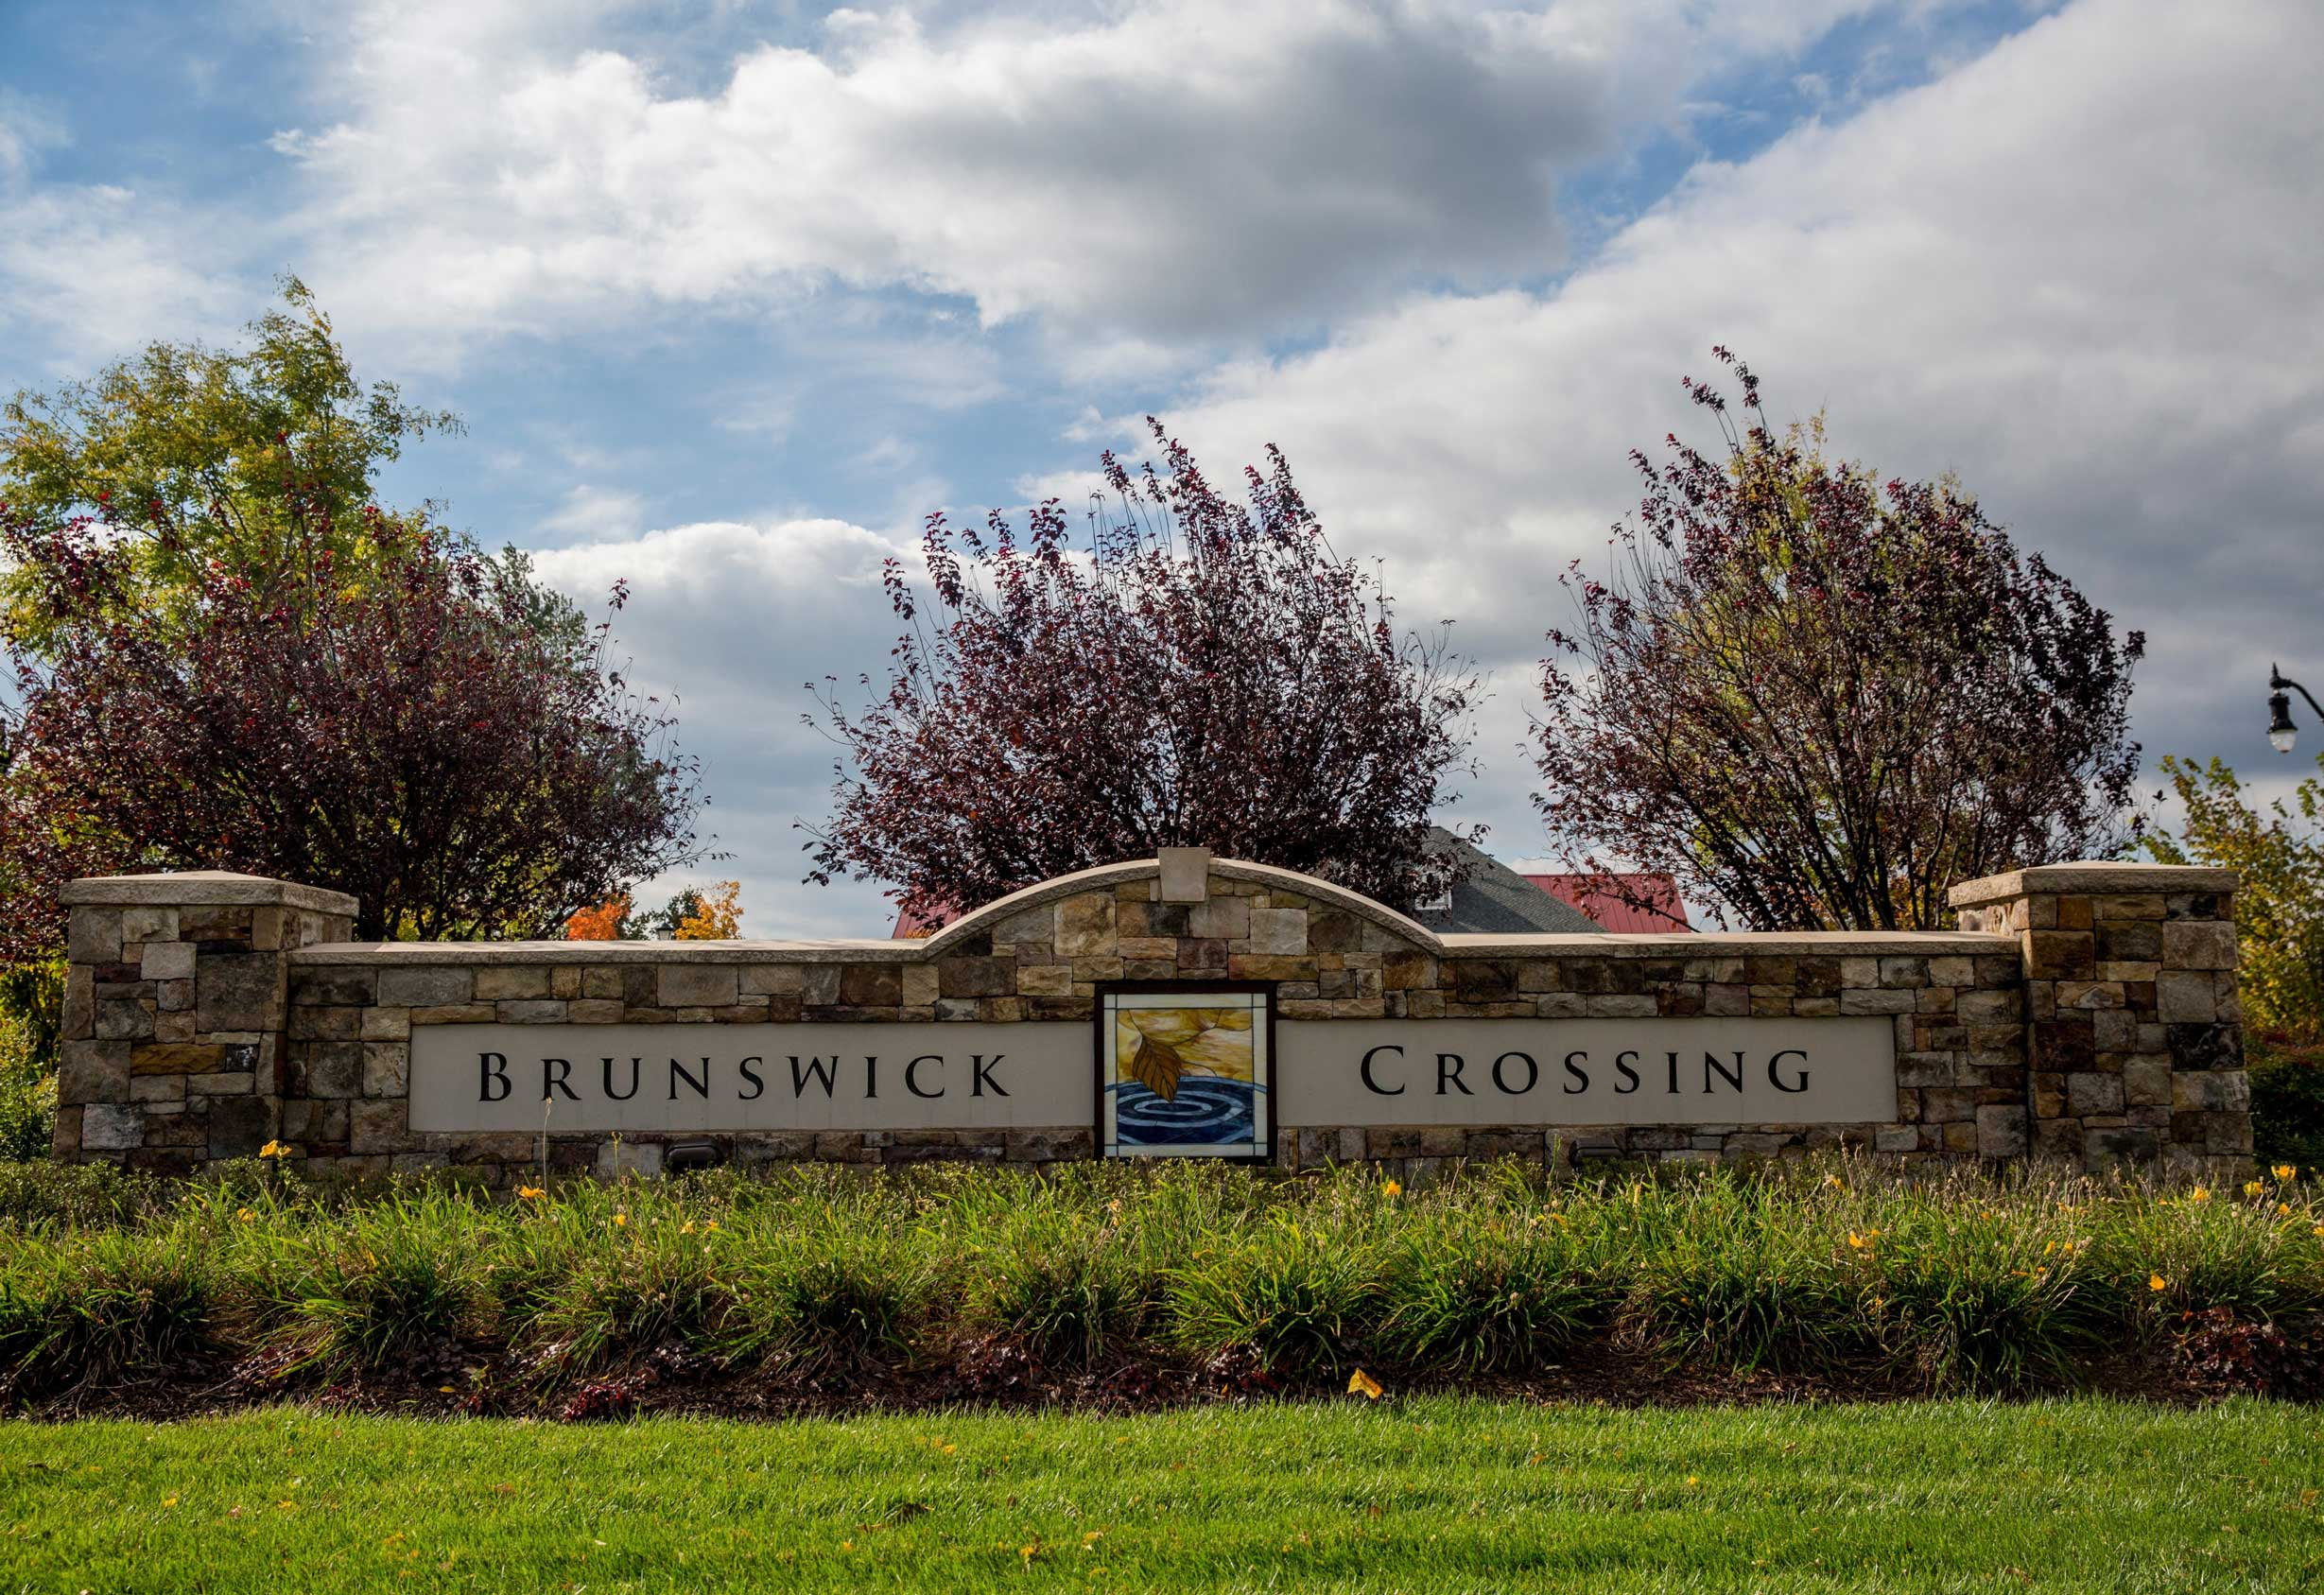 Brunswick_Crossing_089-785438-edited.jpg